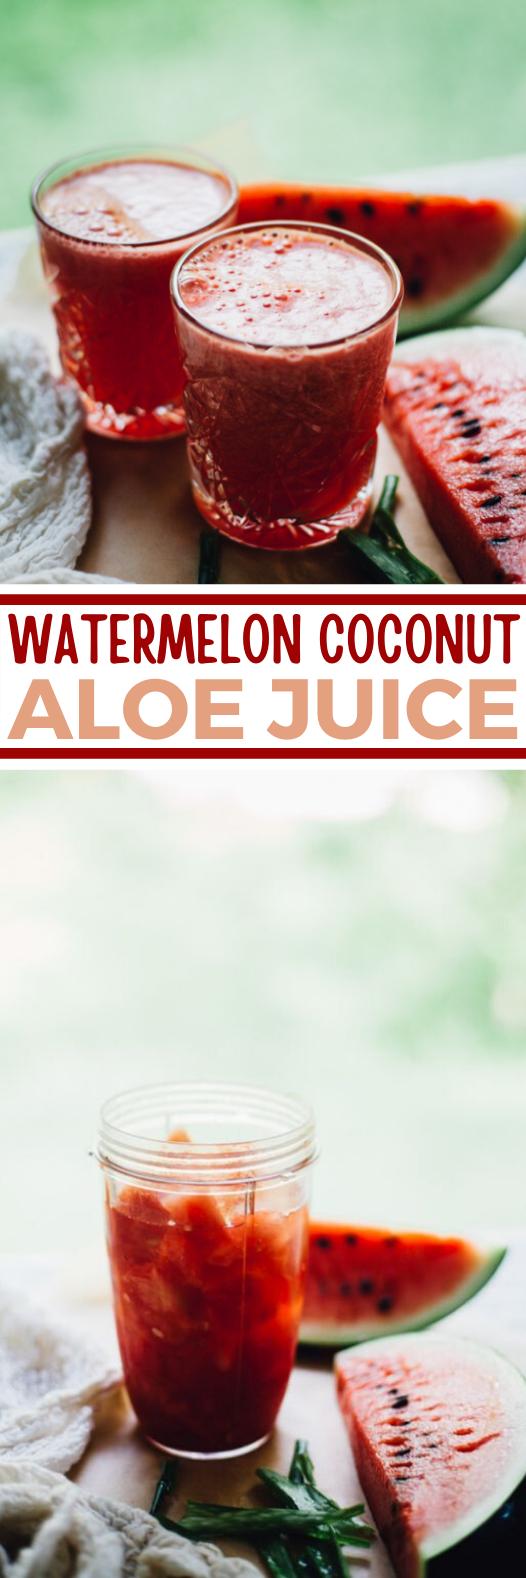 Watermelon Coconut Aloe Juice #healthy #drinks #juice #refreshing #summer